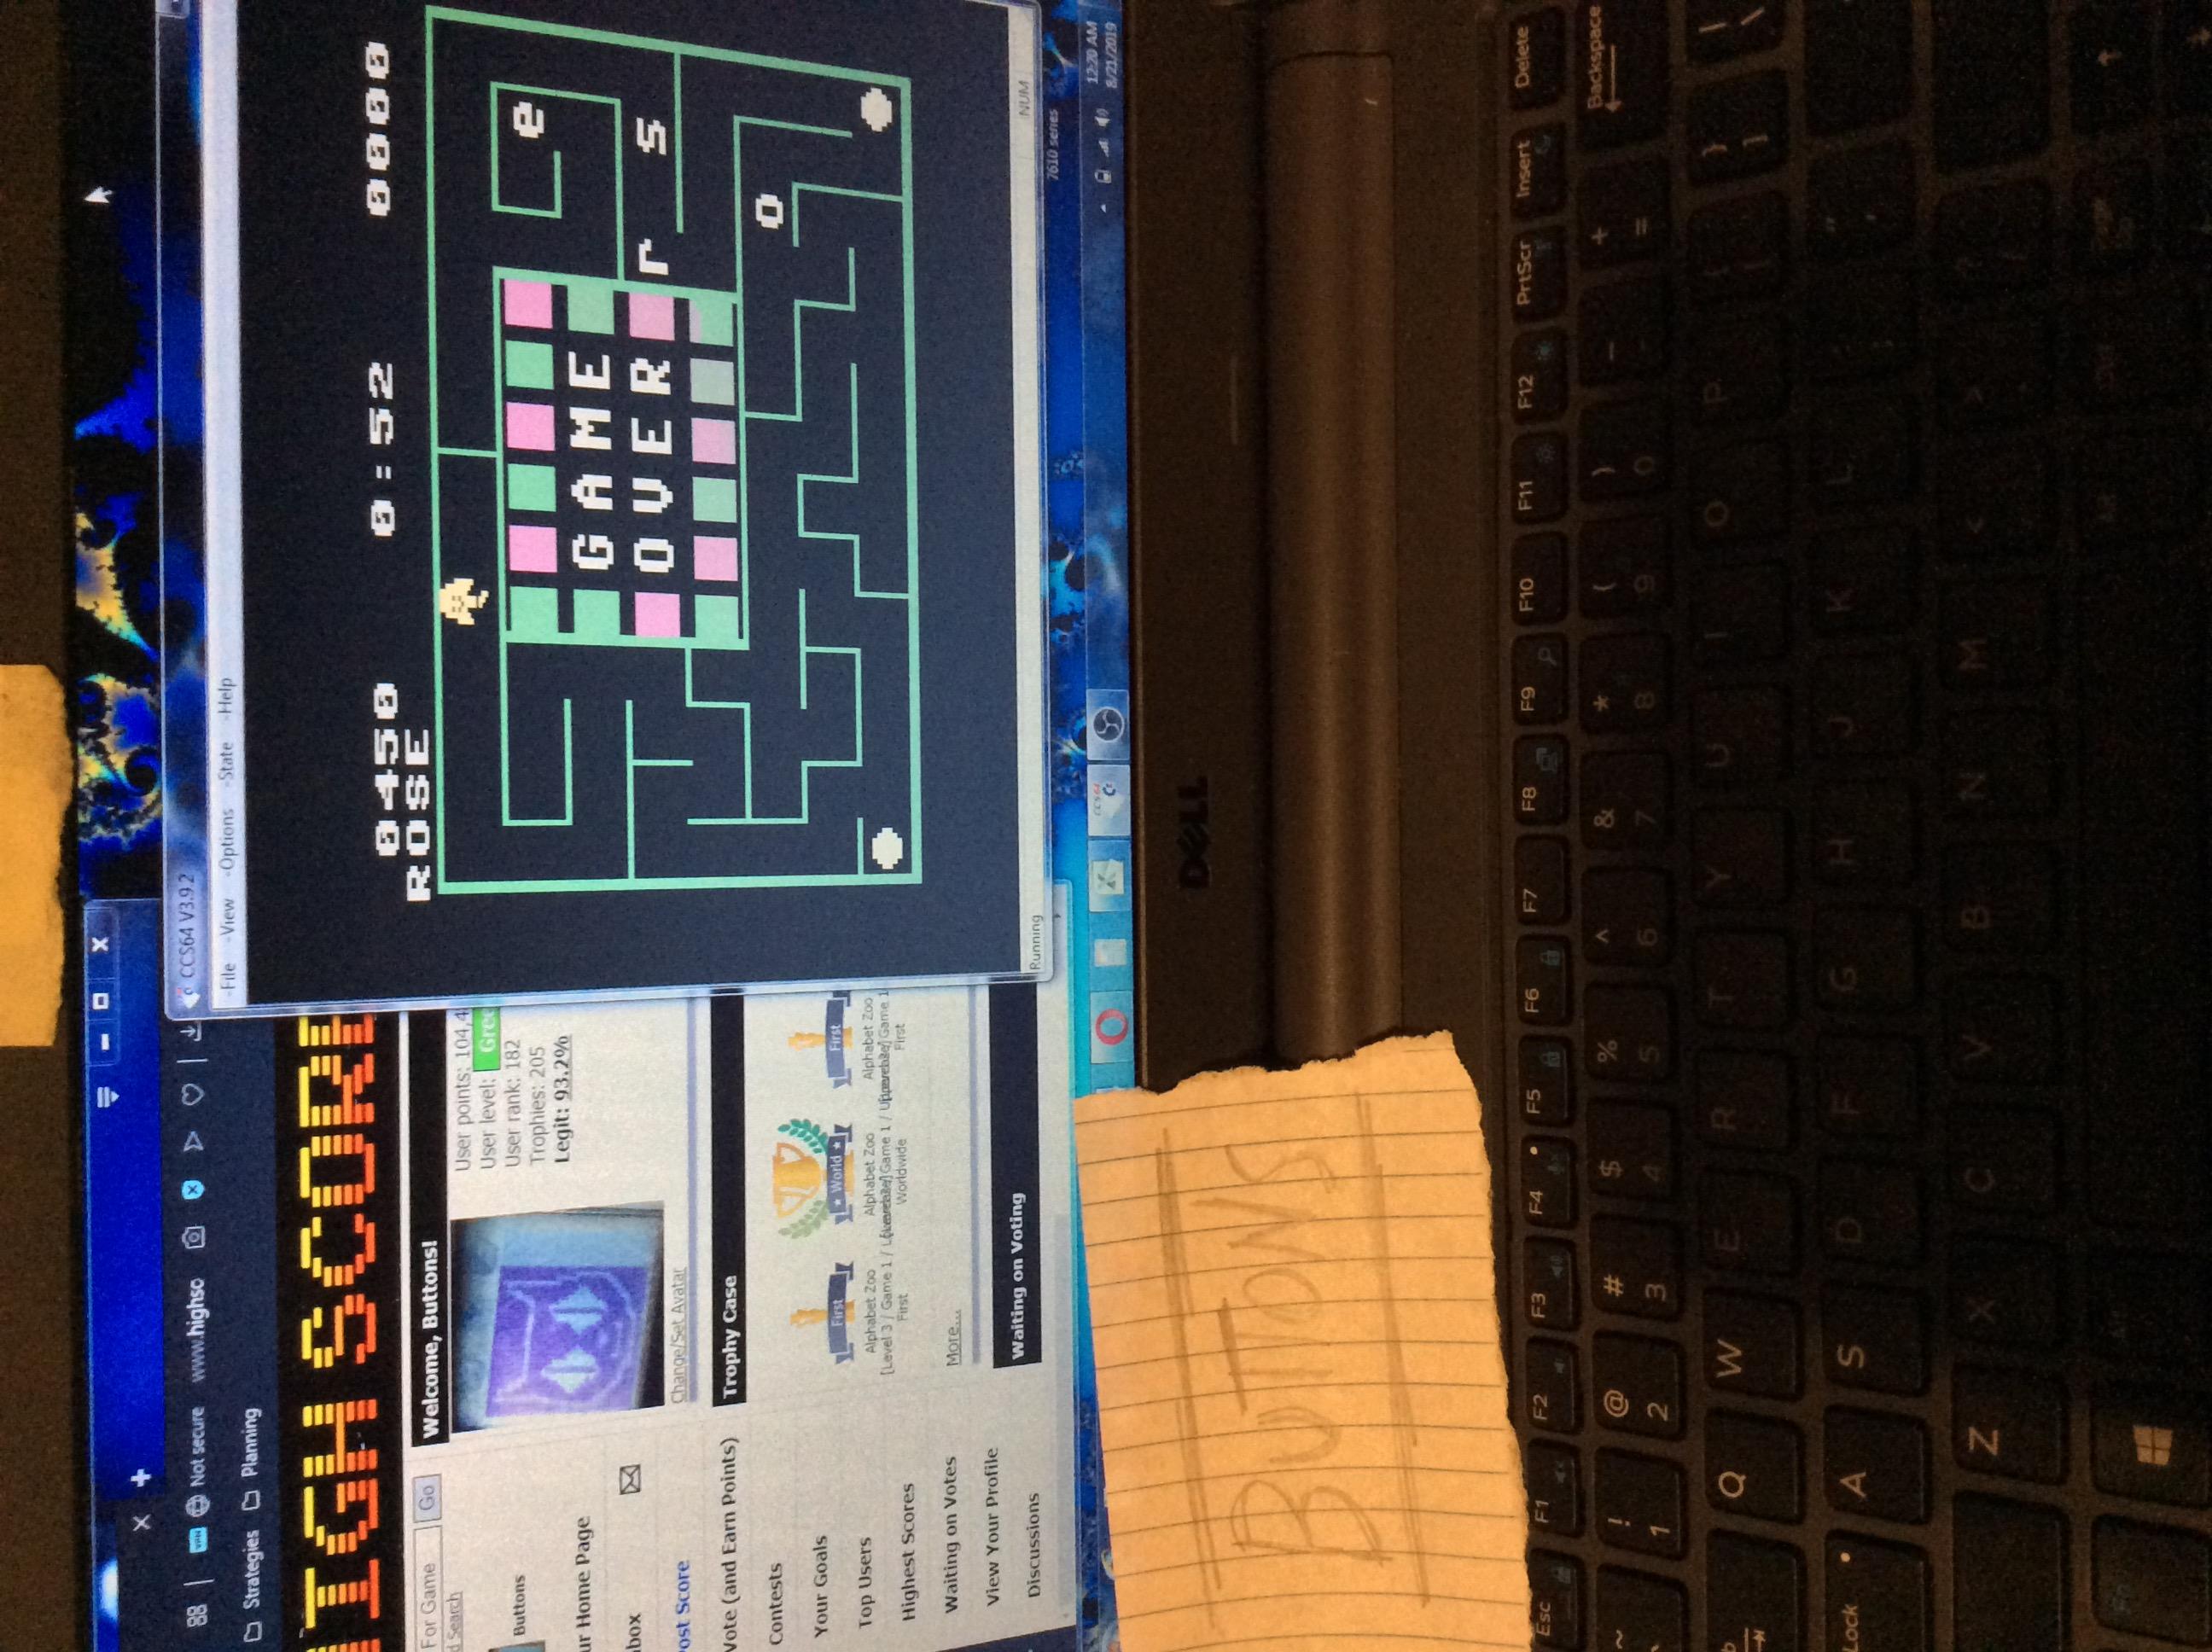 Alphabet Zoo [Level 2 / Game 2 / Uppercase] 450 points